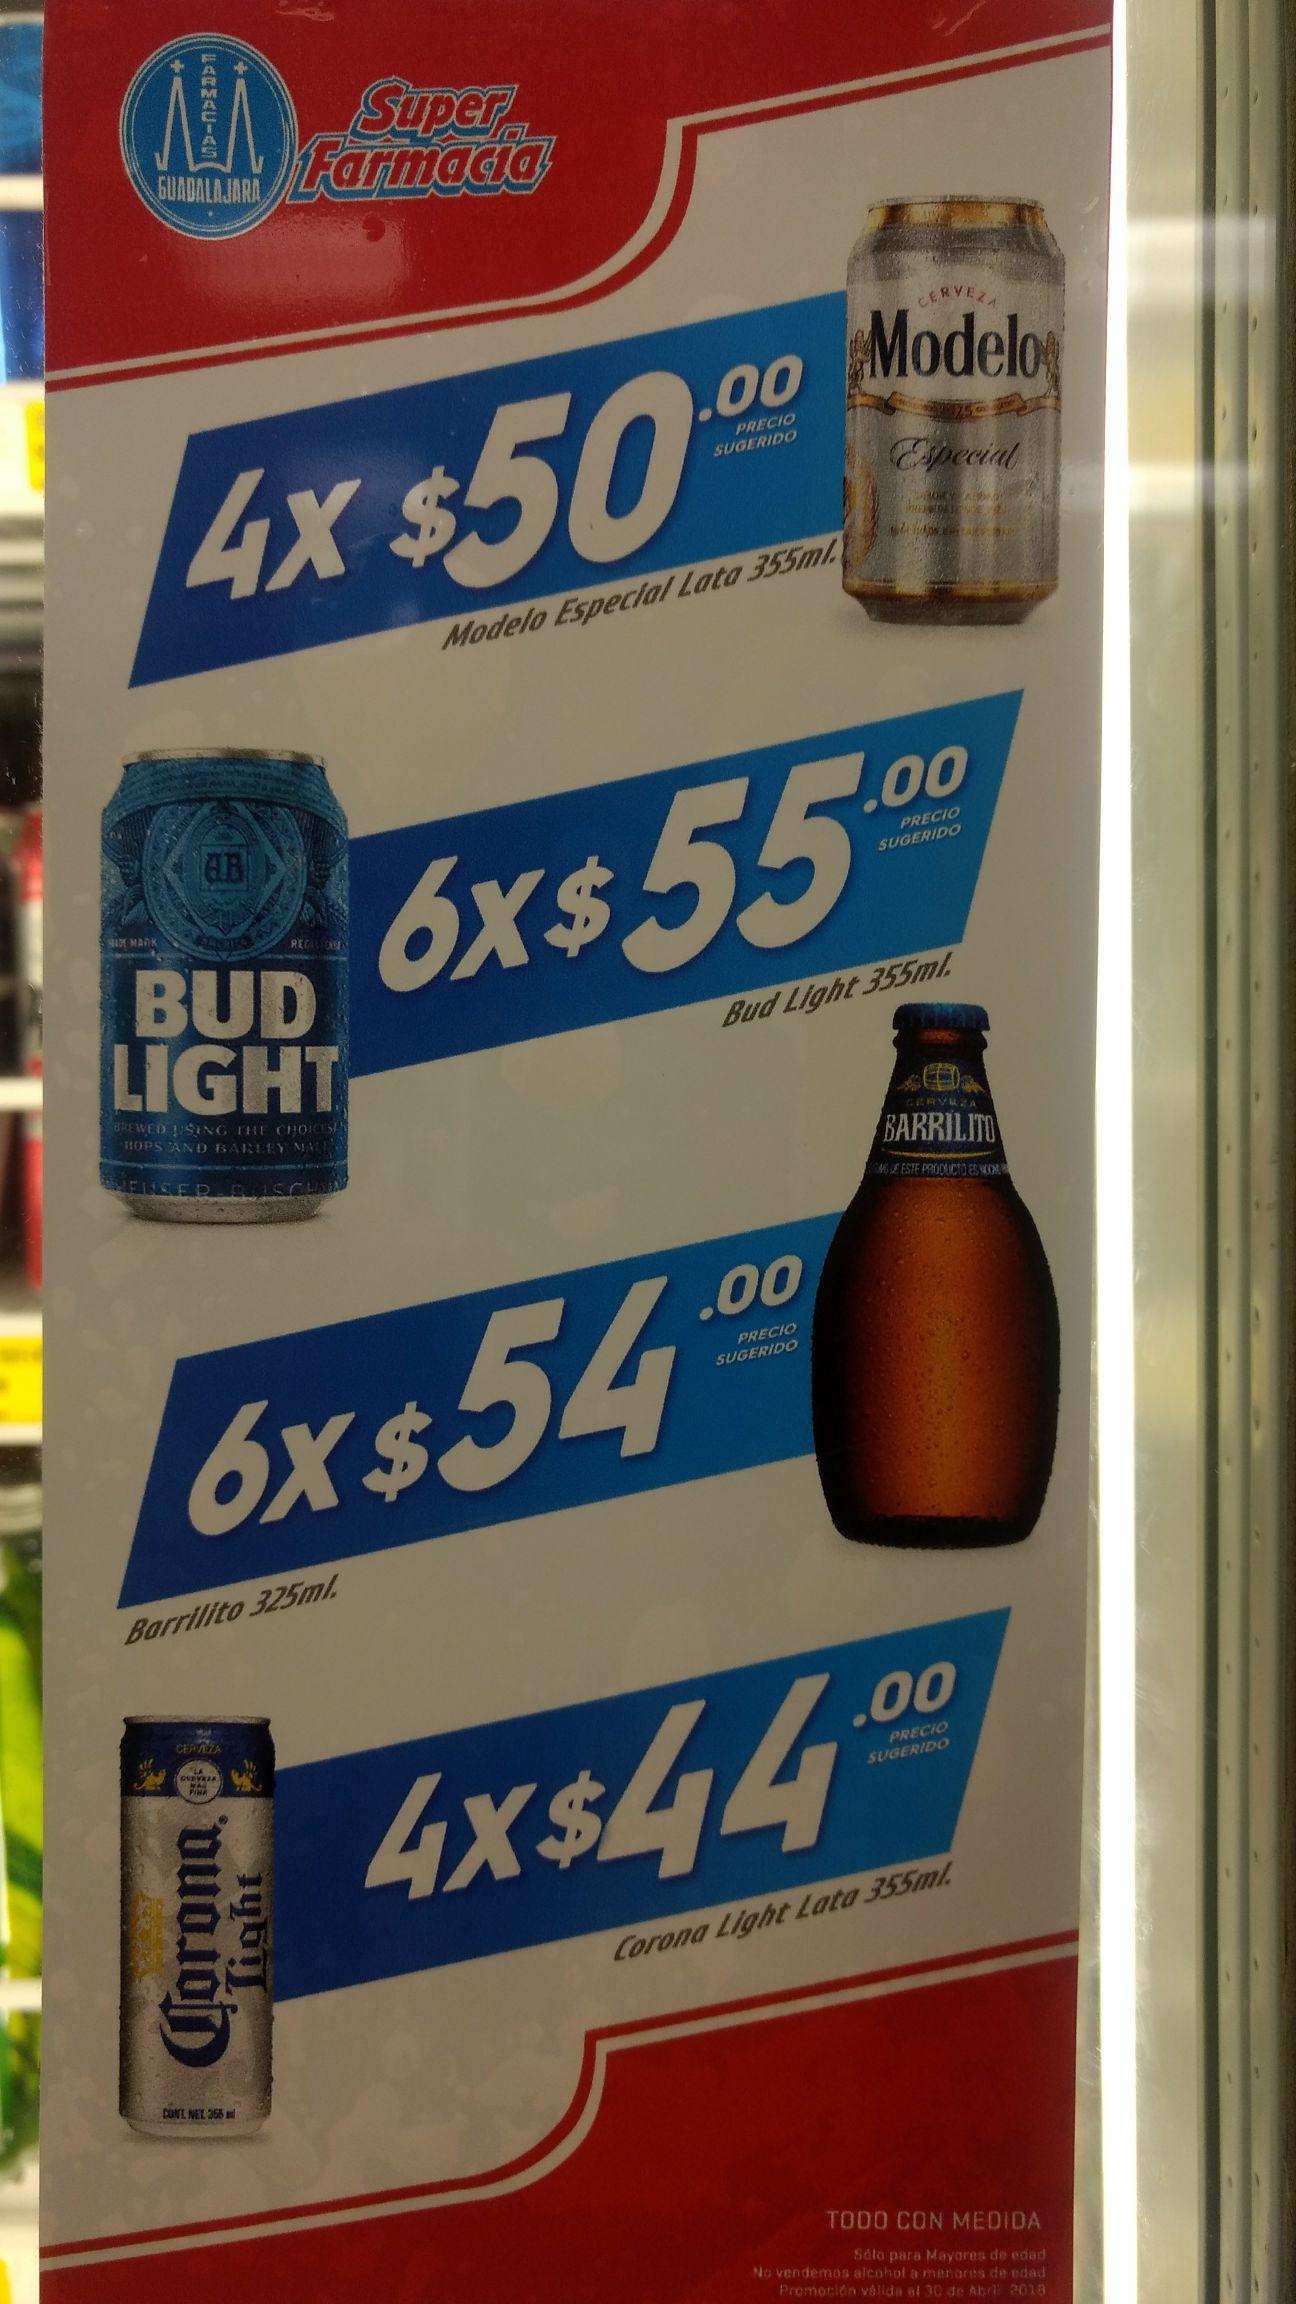 Farmacias Guadalajara: Cervezas a muy buen precio. Corona Light, Barrilito, Modelo, Bud Light